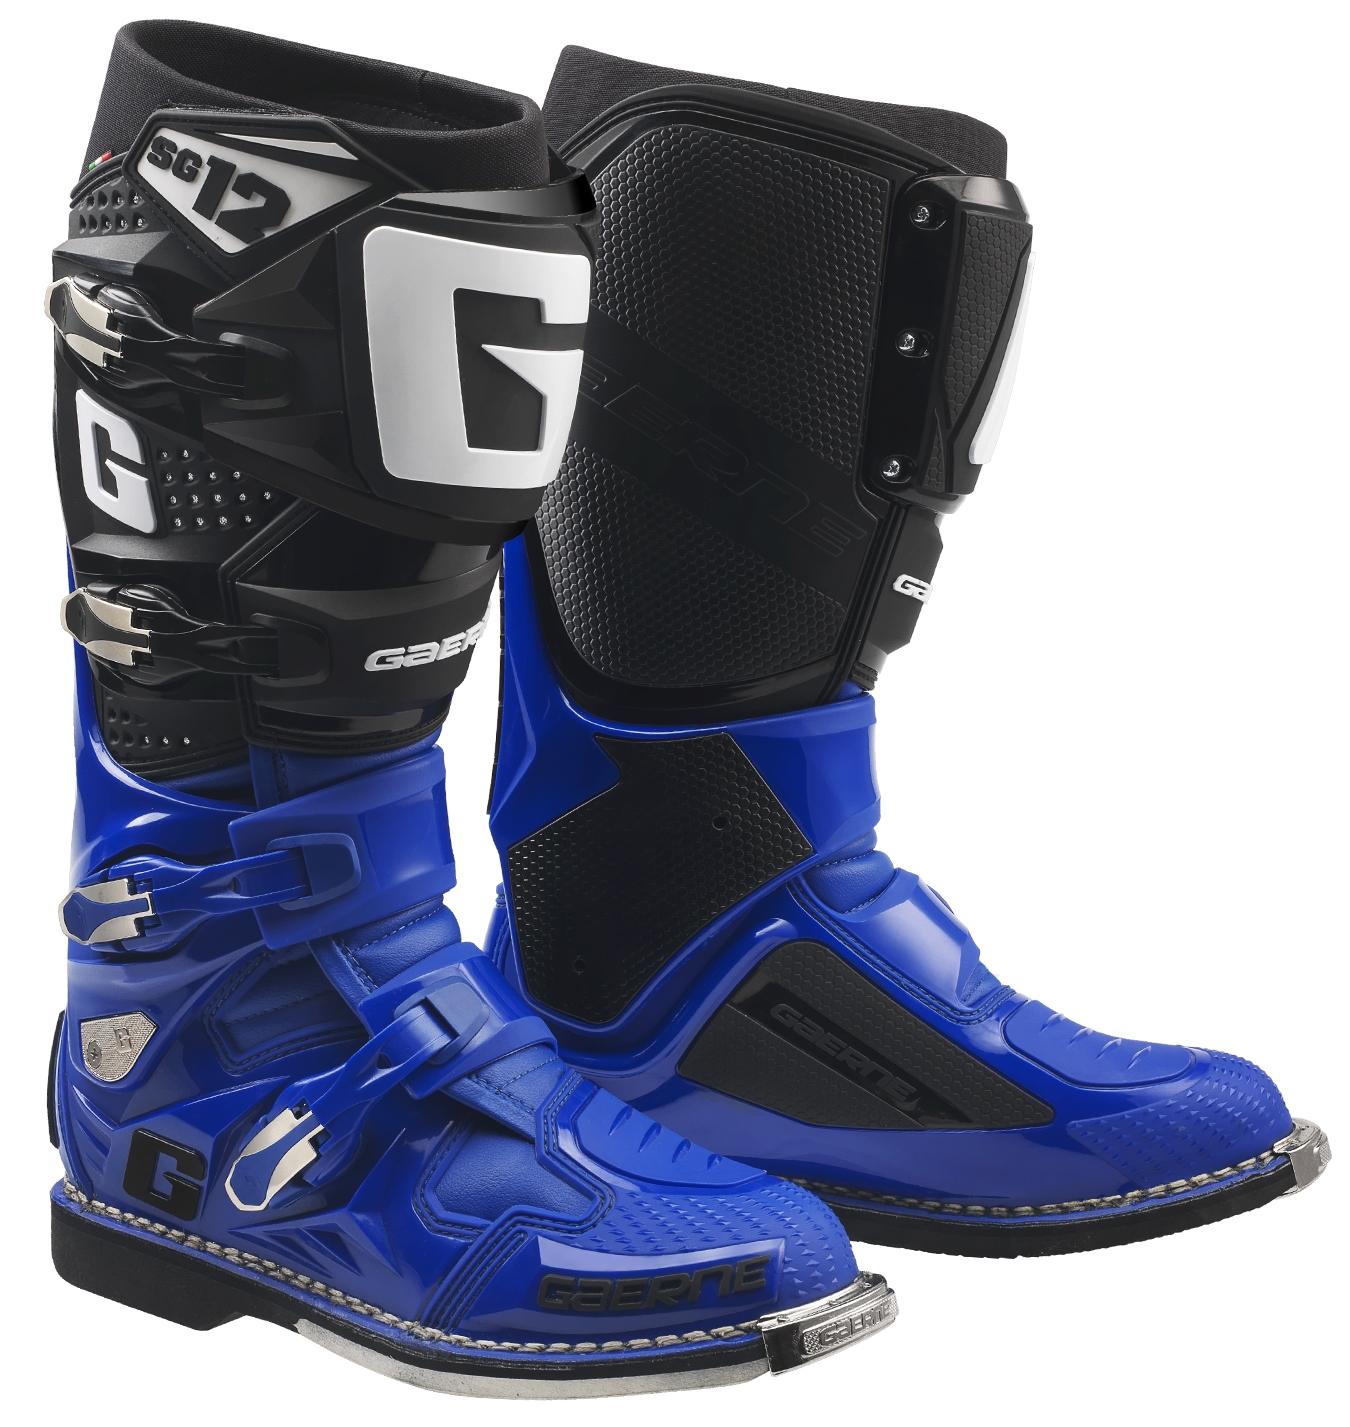 073 CoMx Boot 122174 GaerneThe Blueblack OffroadSg 5A4jRL